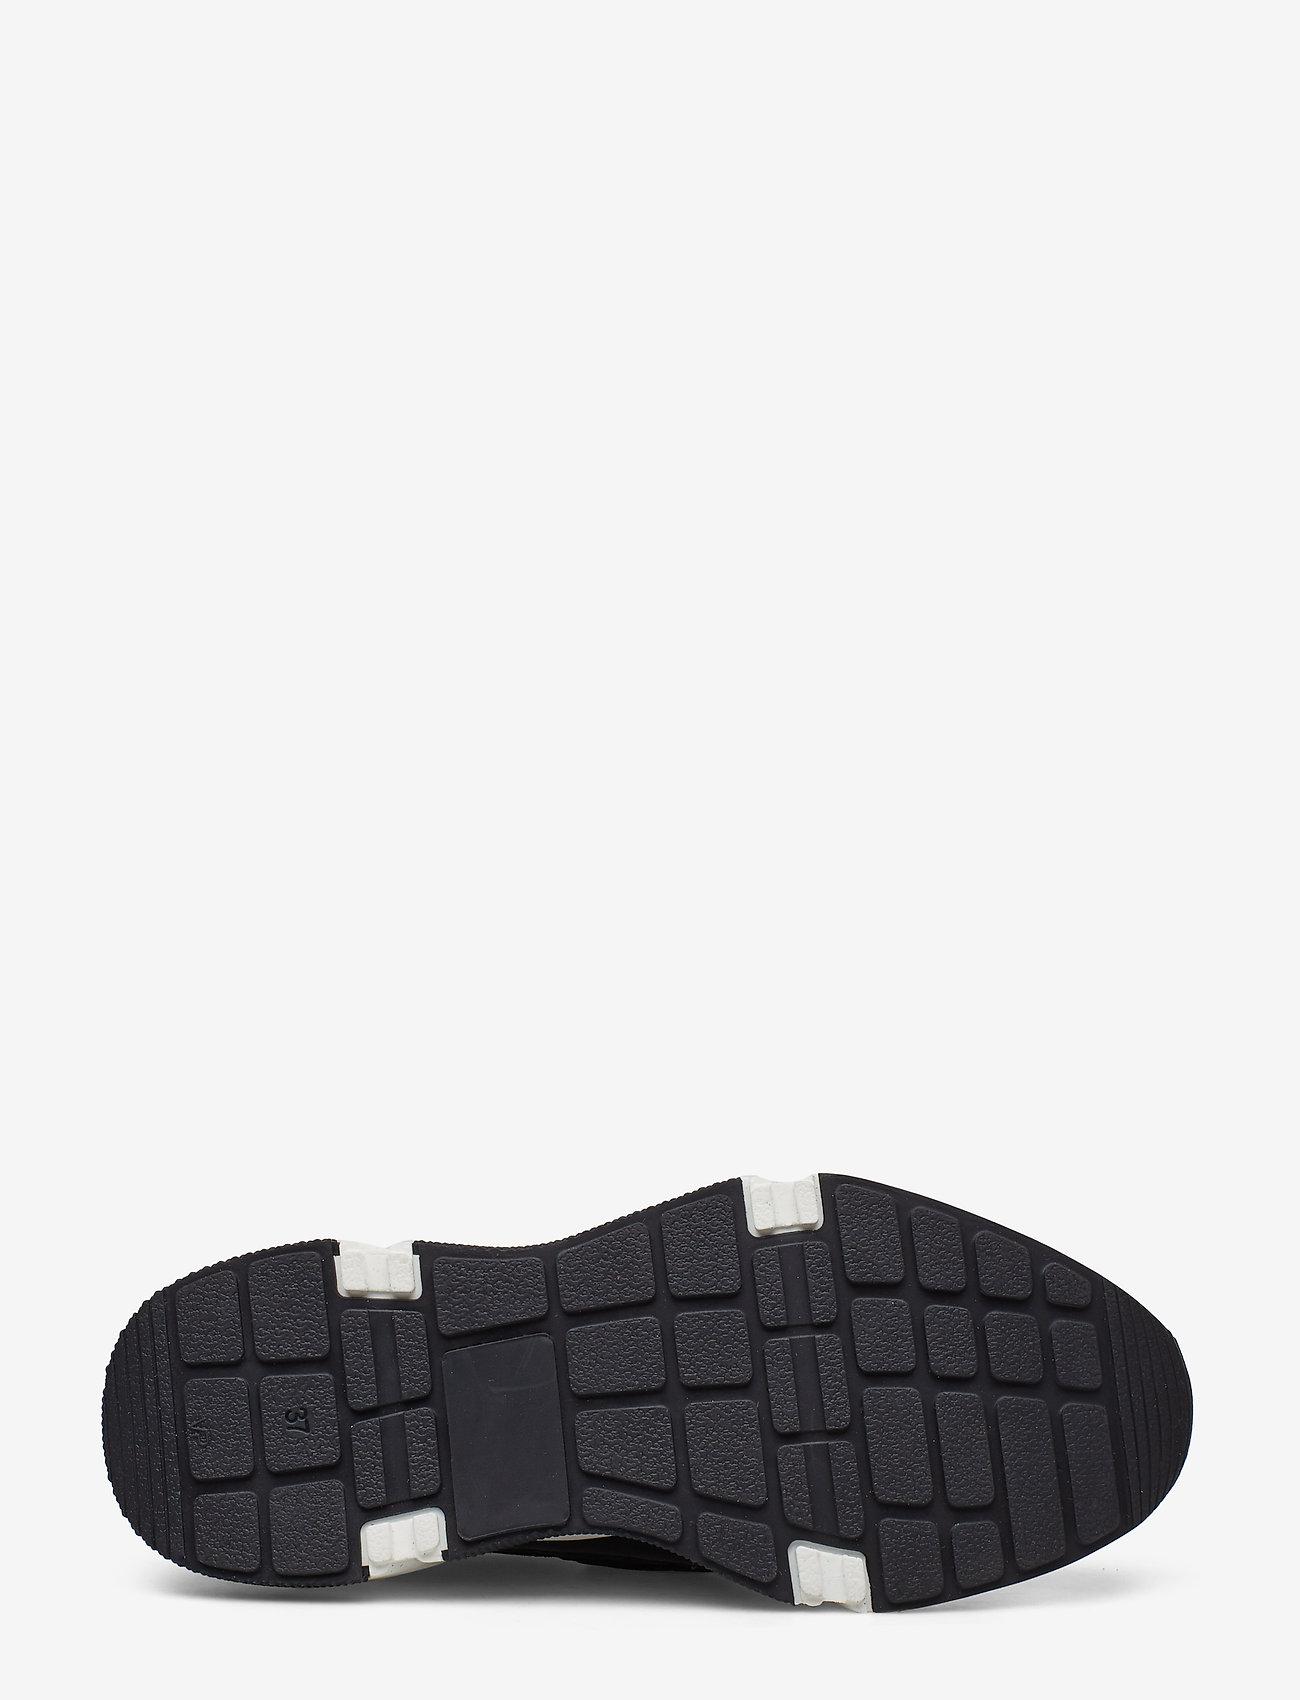 Shoes 8841 (Black/bottle Green Comb.956) - Billi Bi